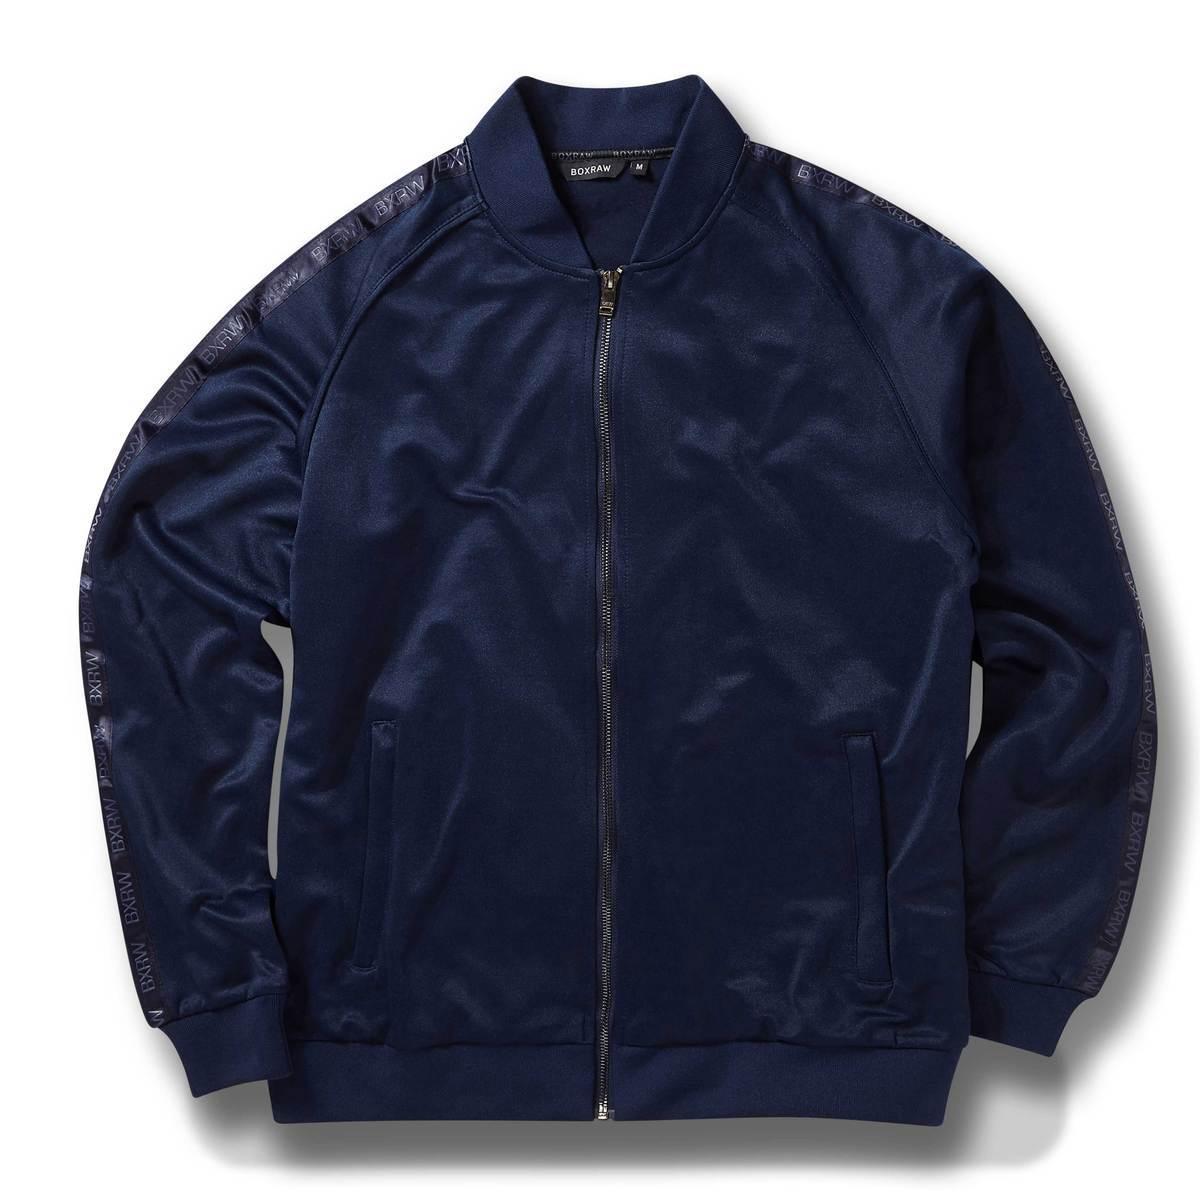 BOXRAW WHITAKER Jacke Navy Blau